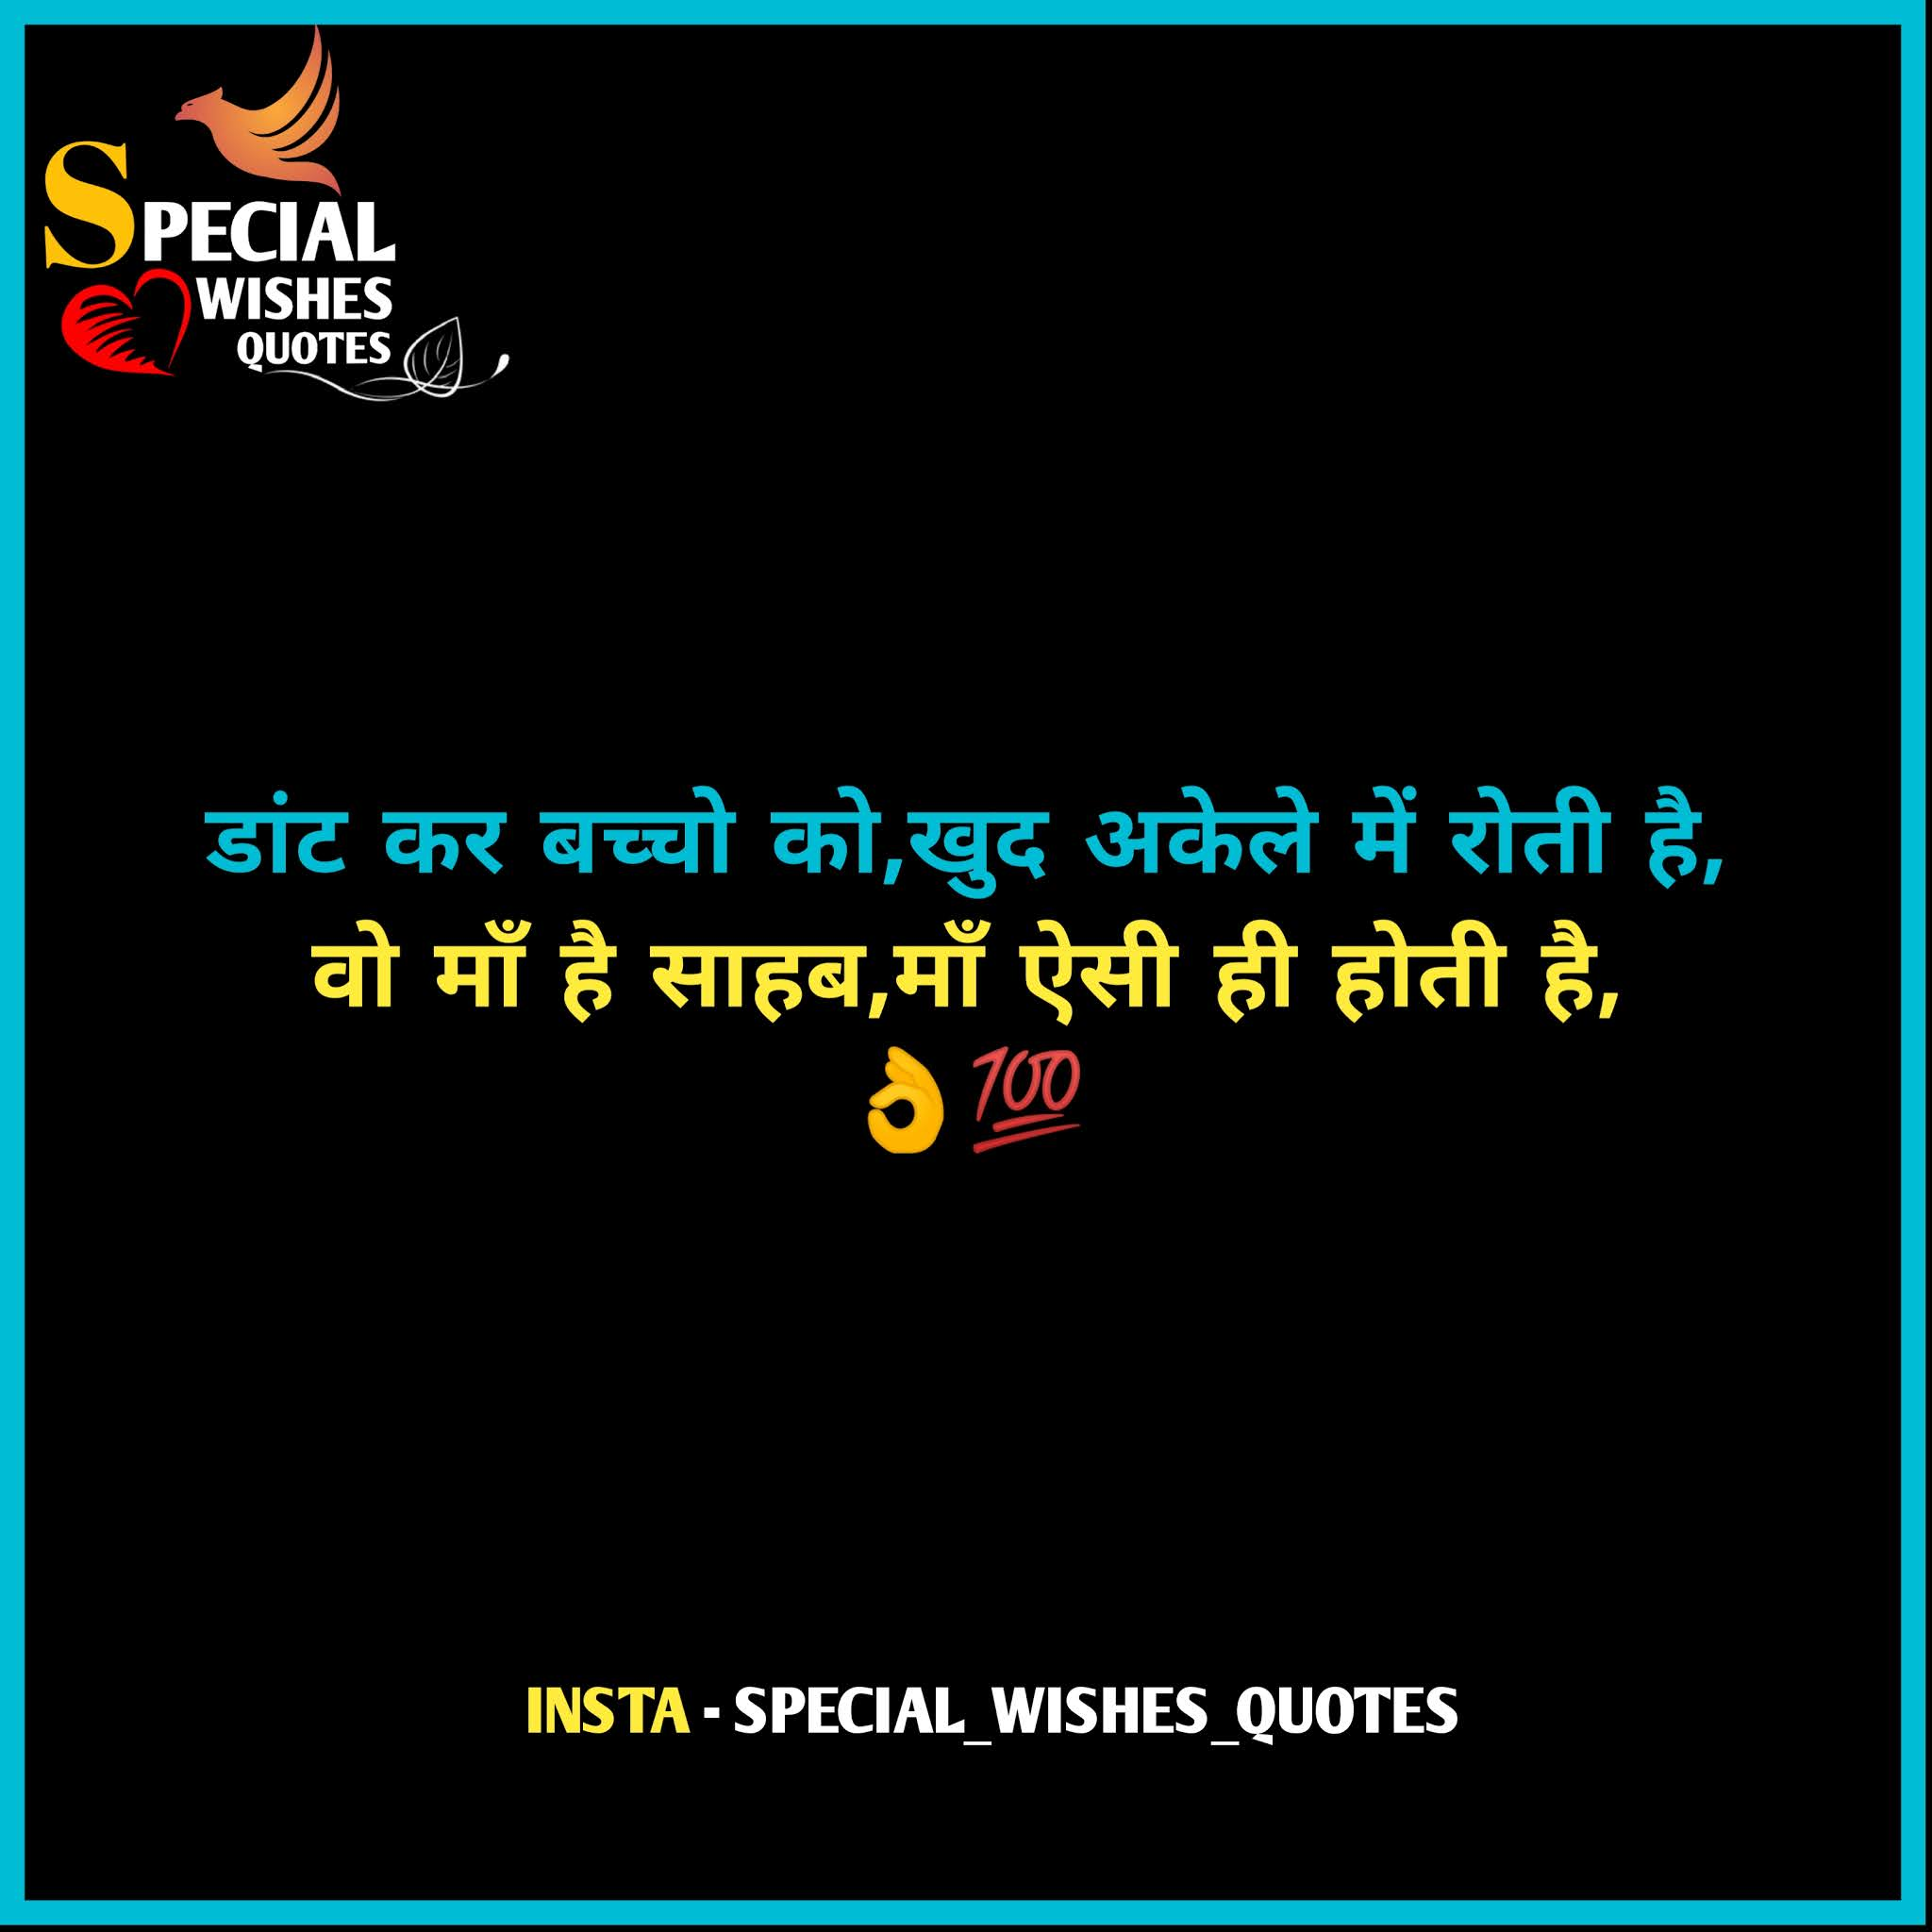 Maa ki Dard Bhari Shayari